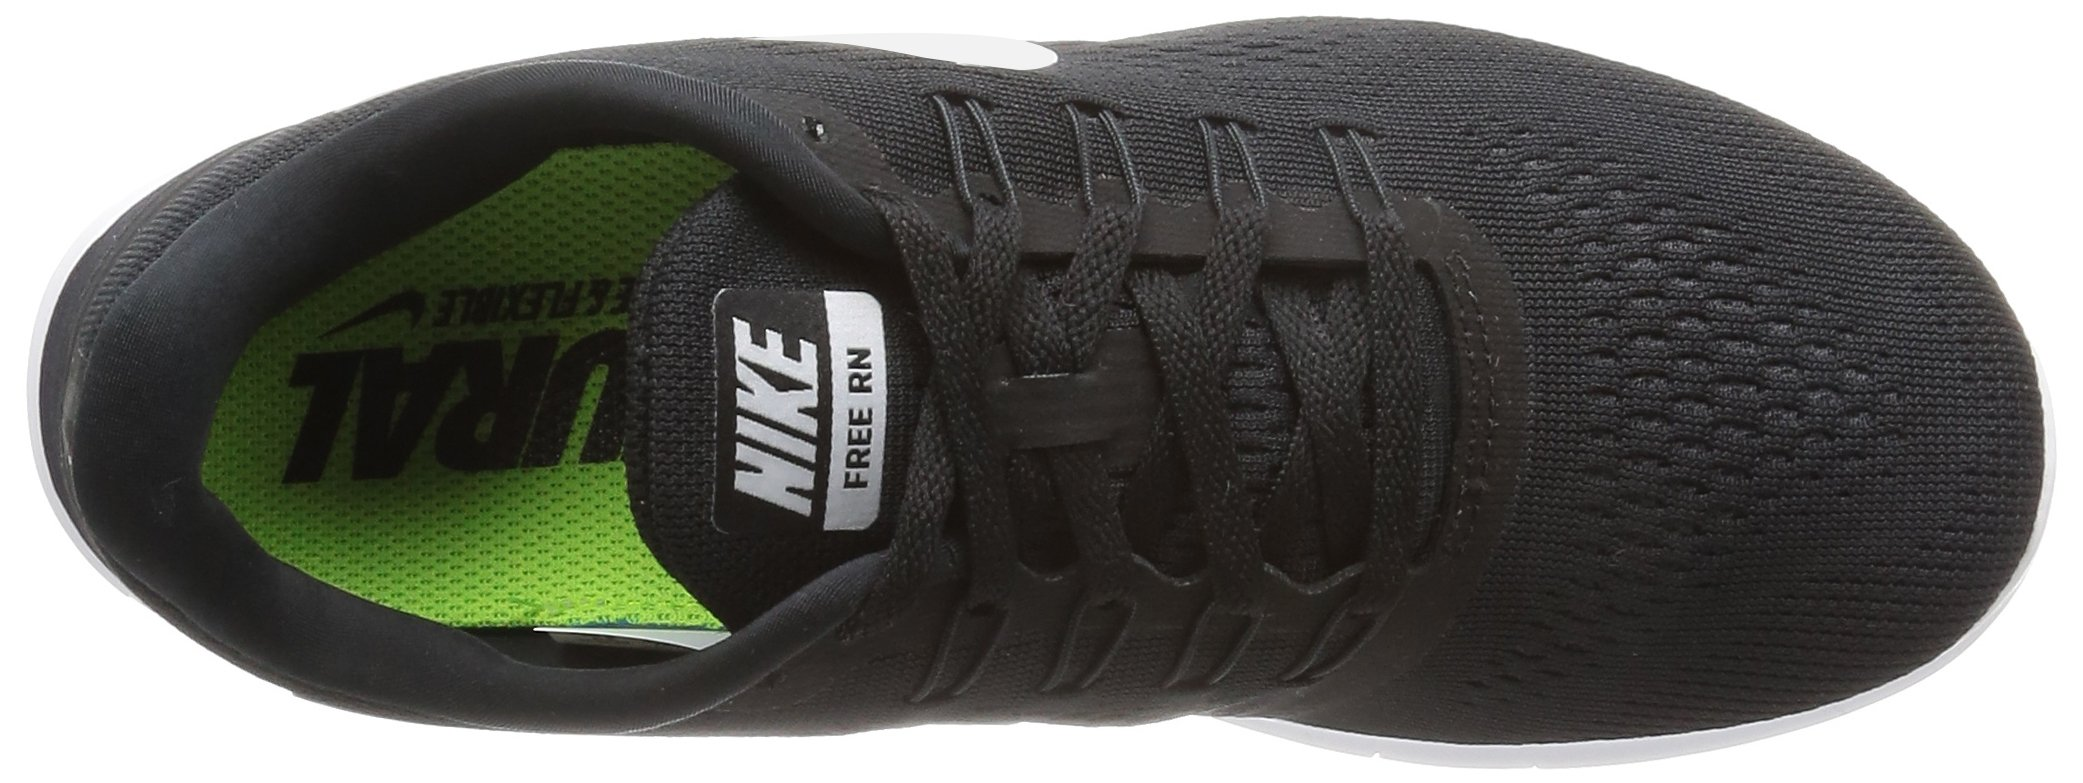 Women's Nike Free RN Running Shoe Black/Anthracite/White Size 8.5 M US